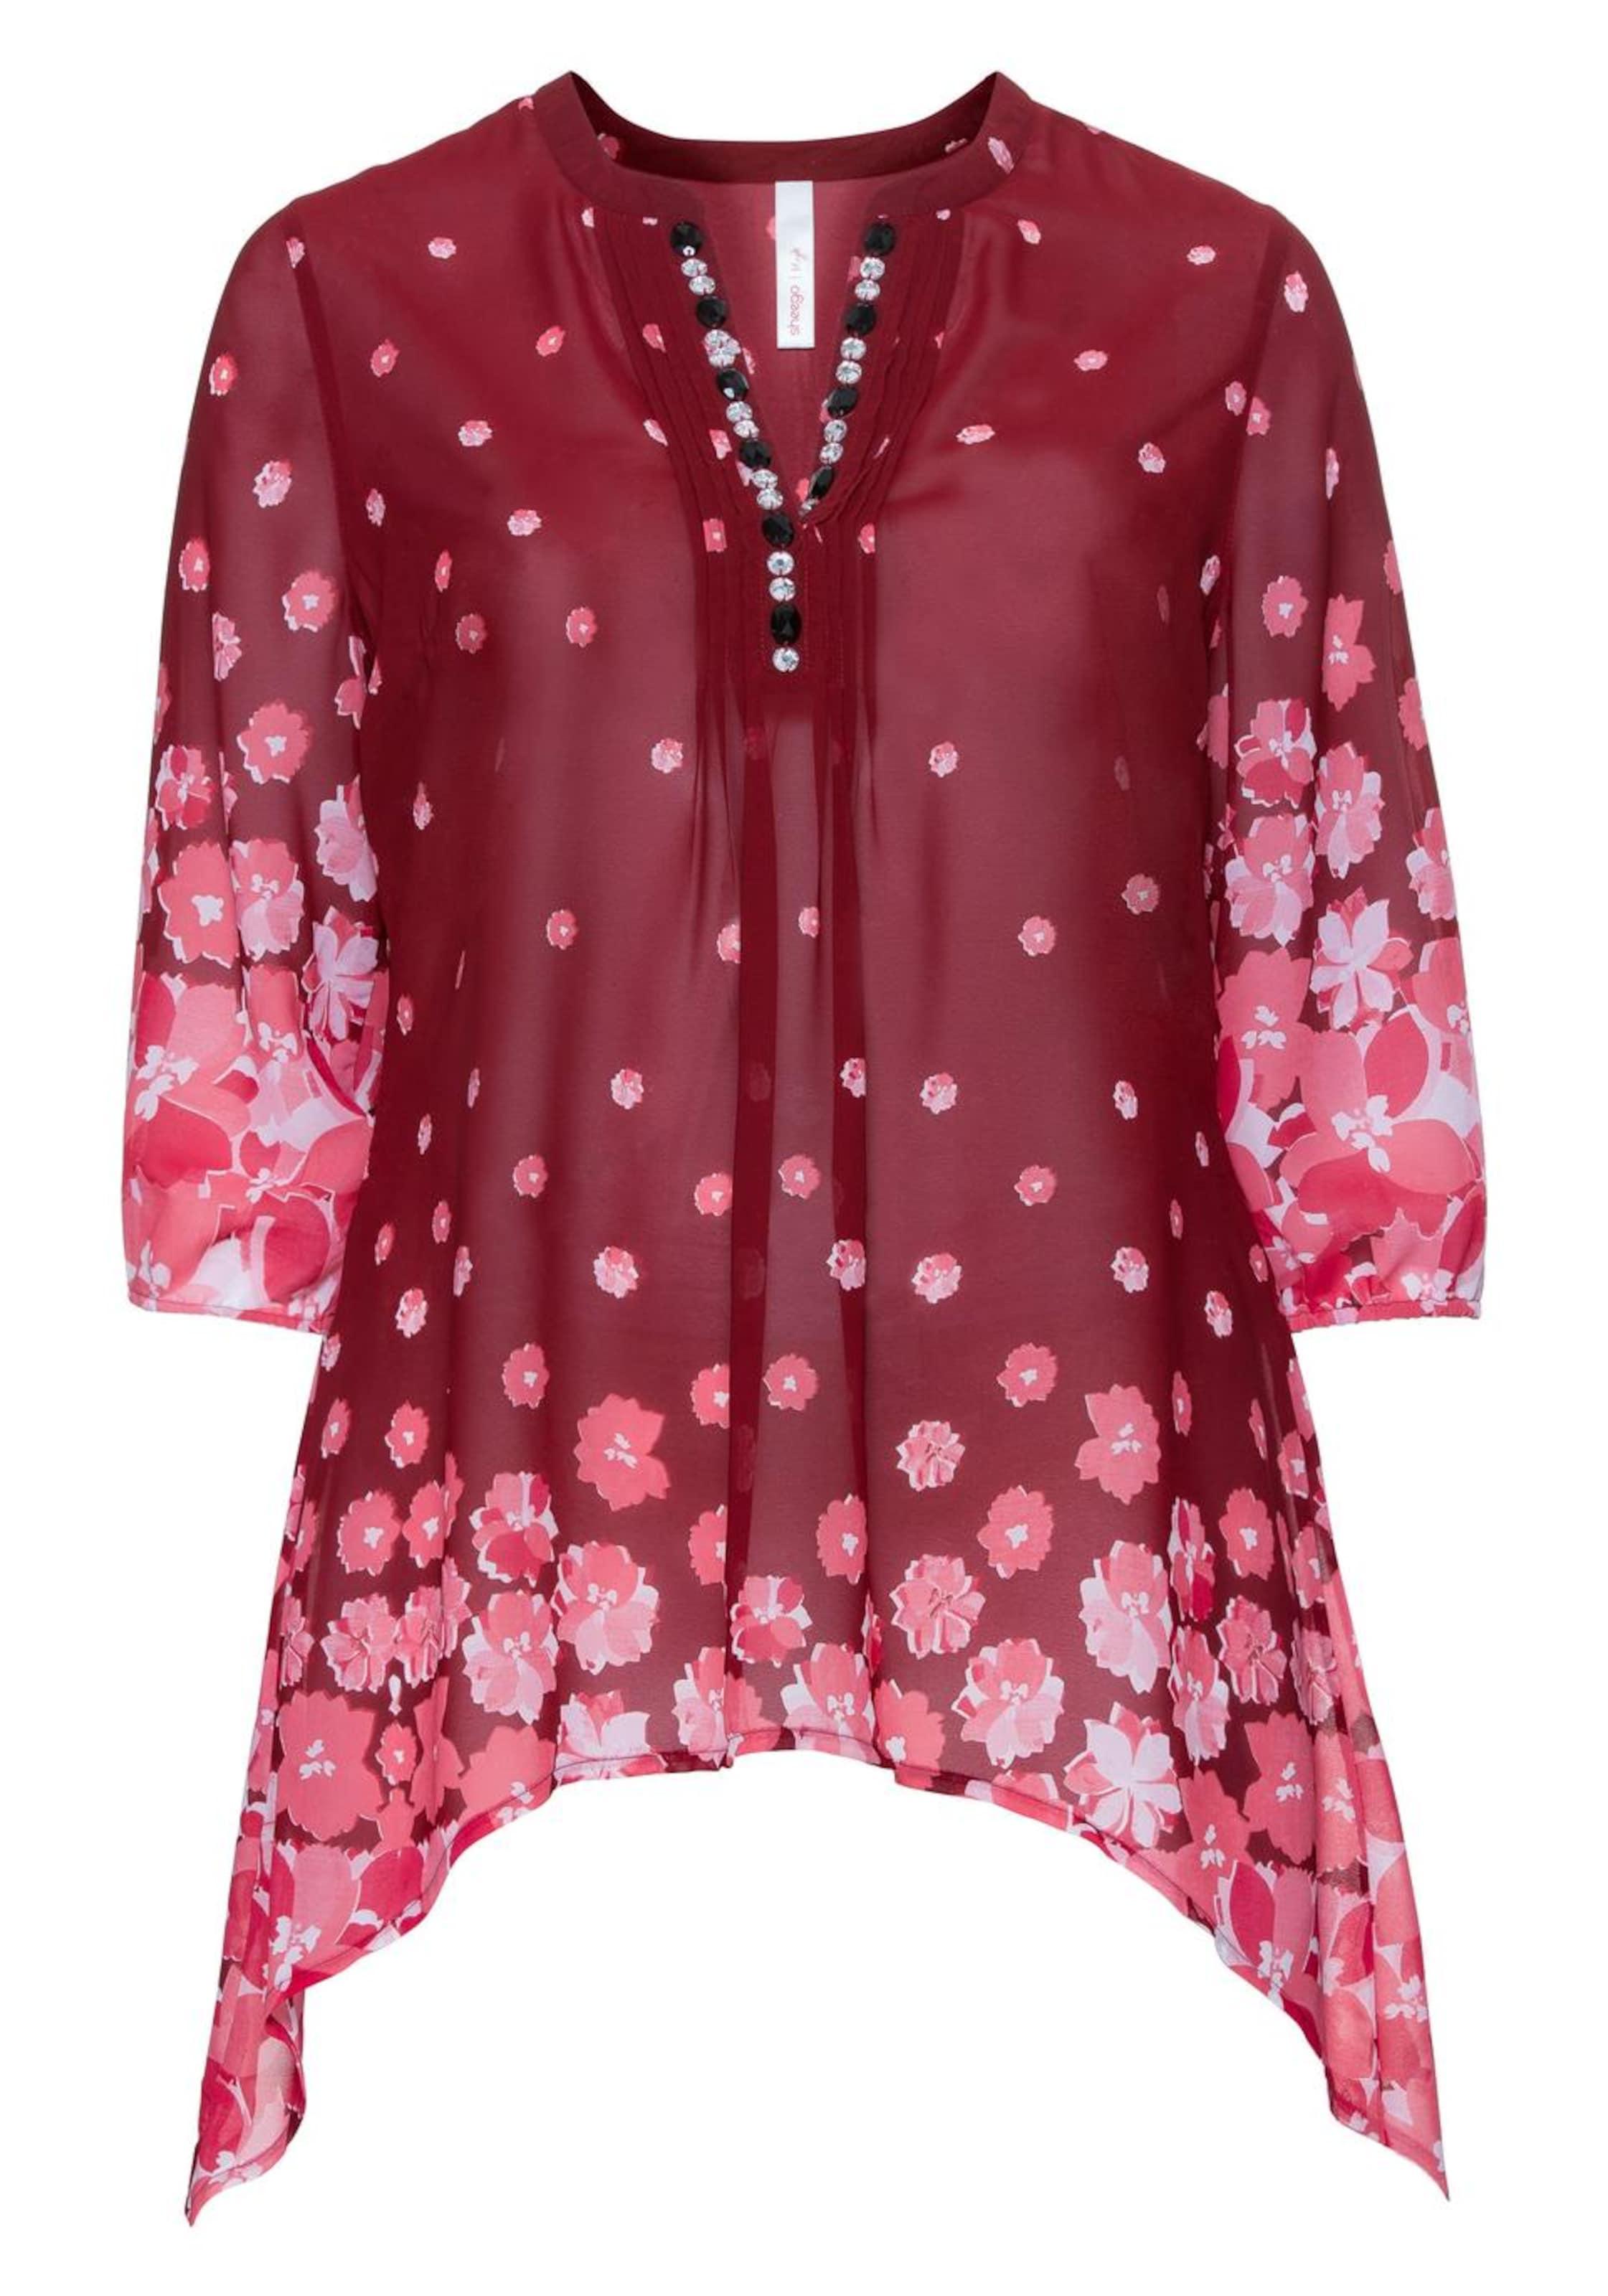 Style PinkRubinrot Sheego In Weiß Tunika Kl1cFJ